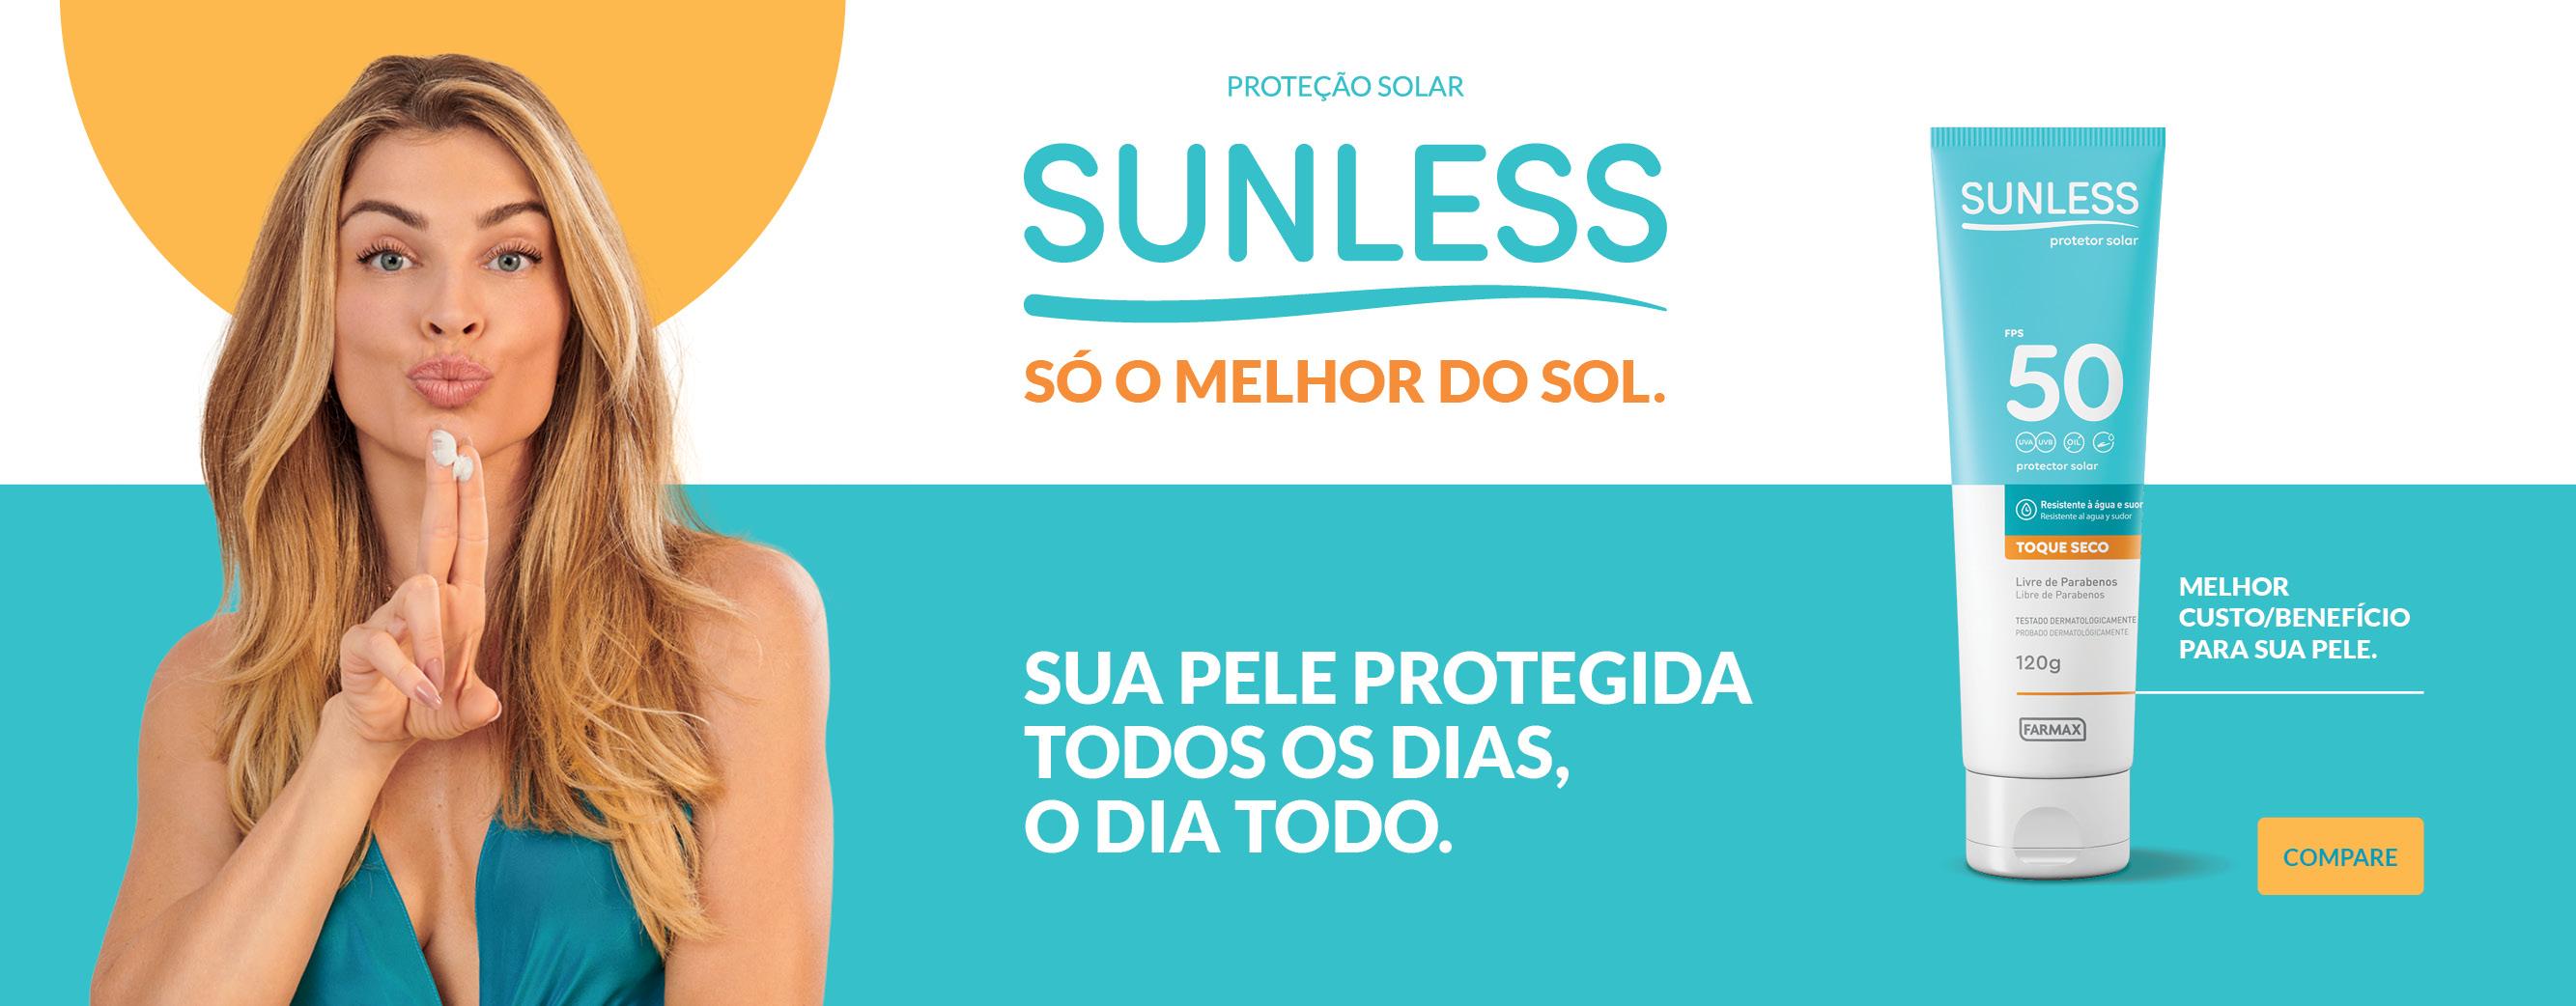 Banner Sunless Grazi